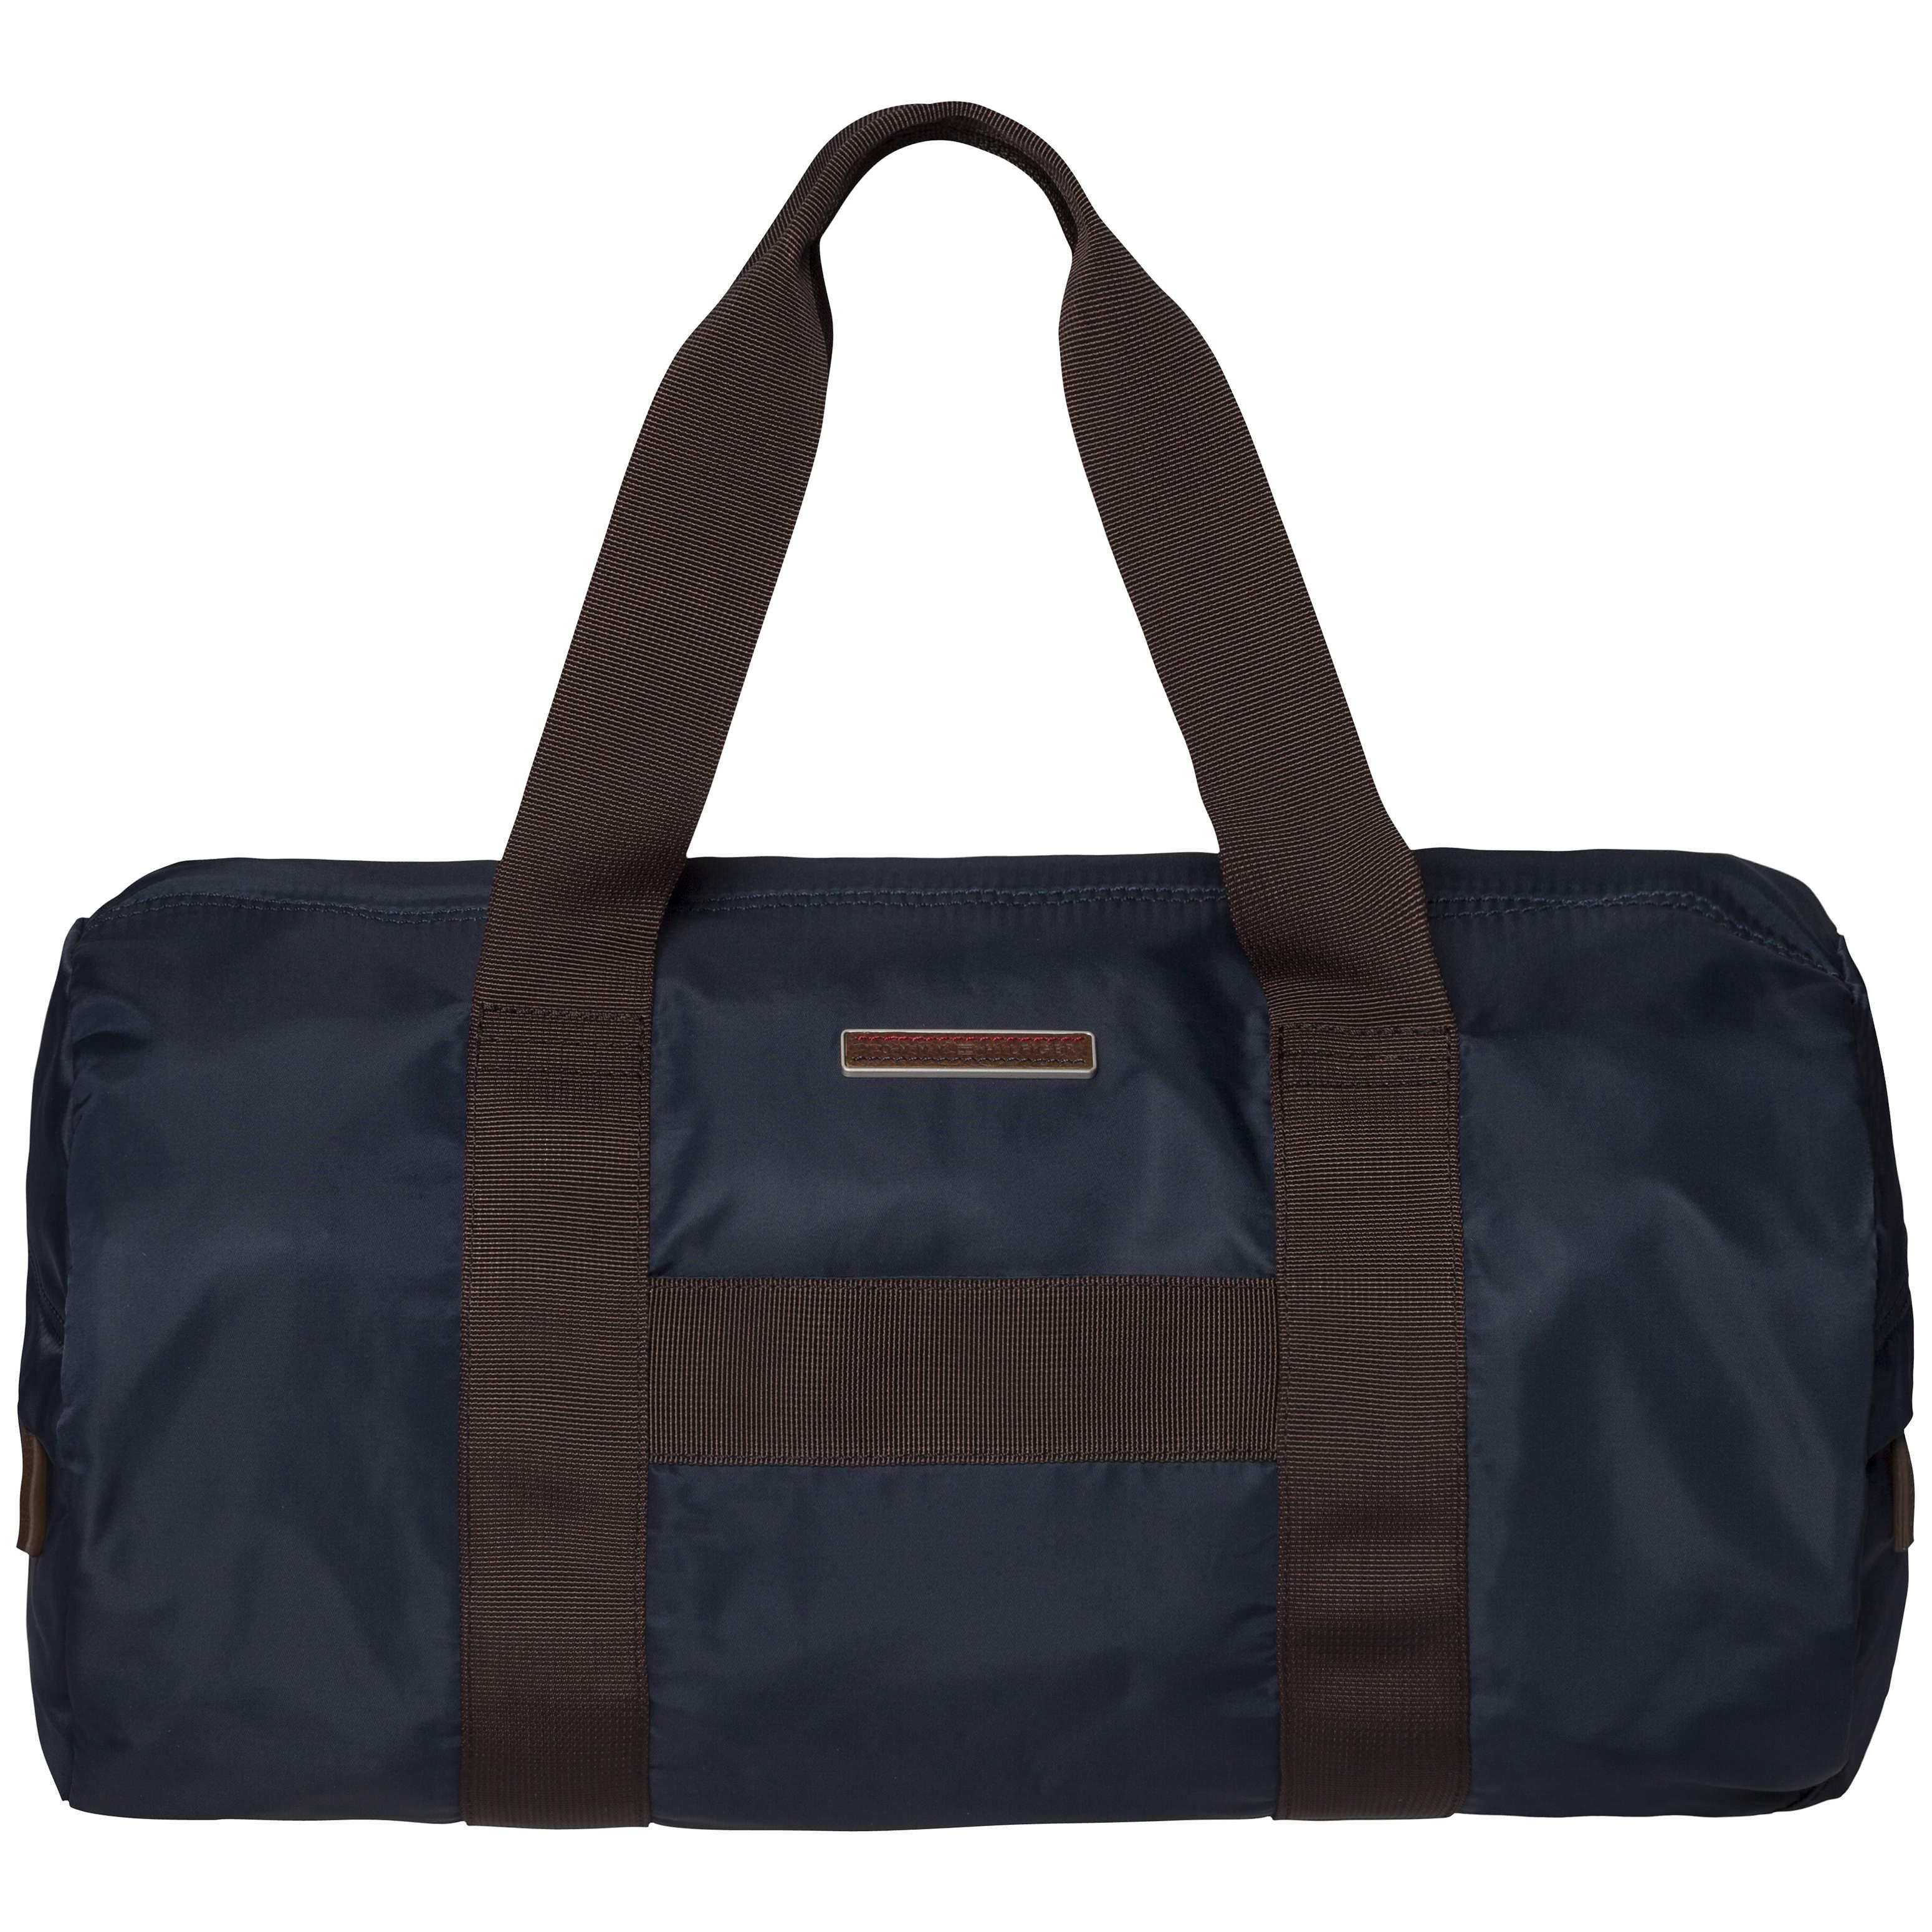 Tommy Hilfiger Handtaschen »SPENCER DUFFLE«